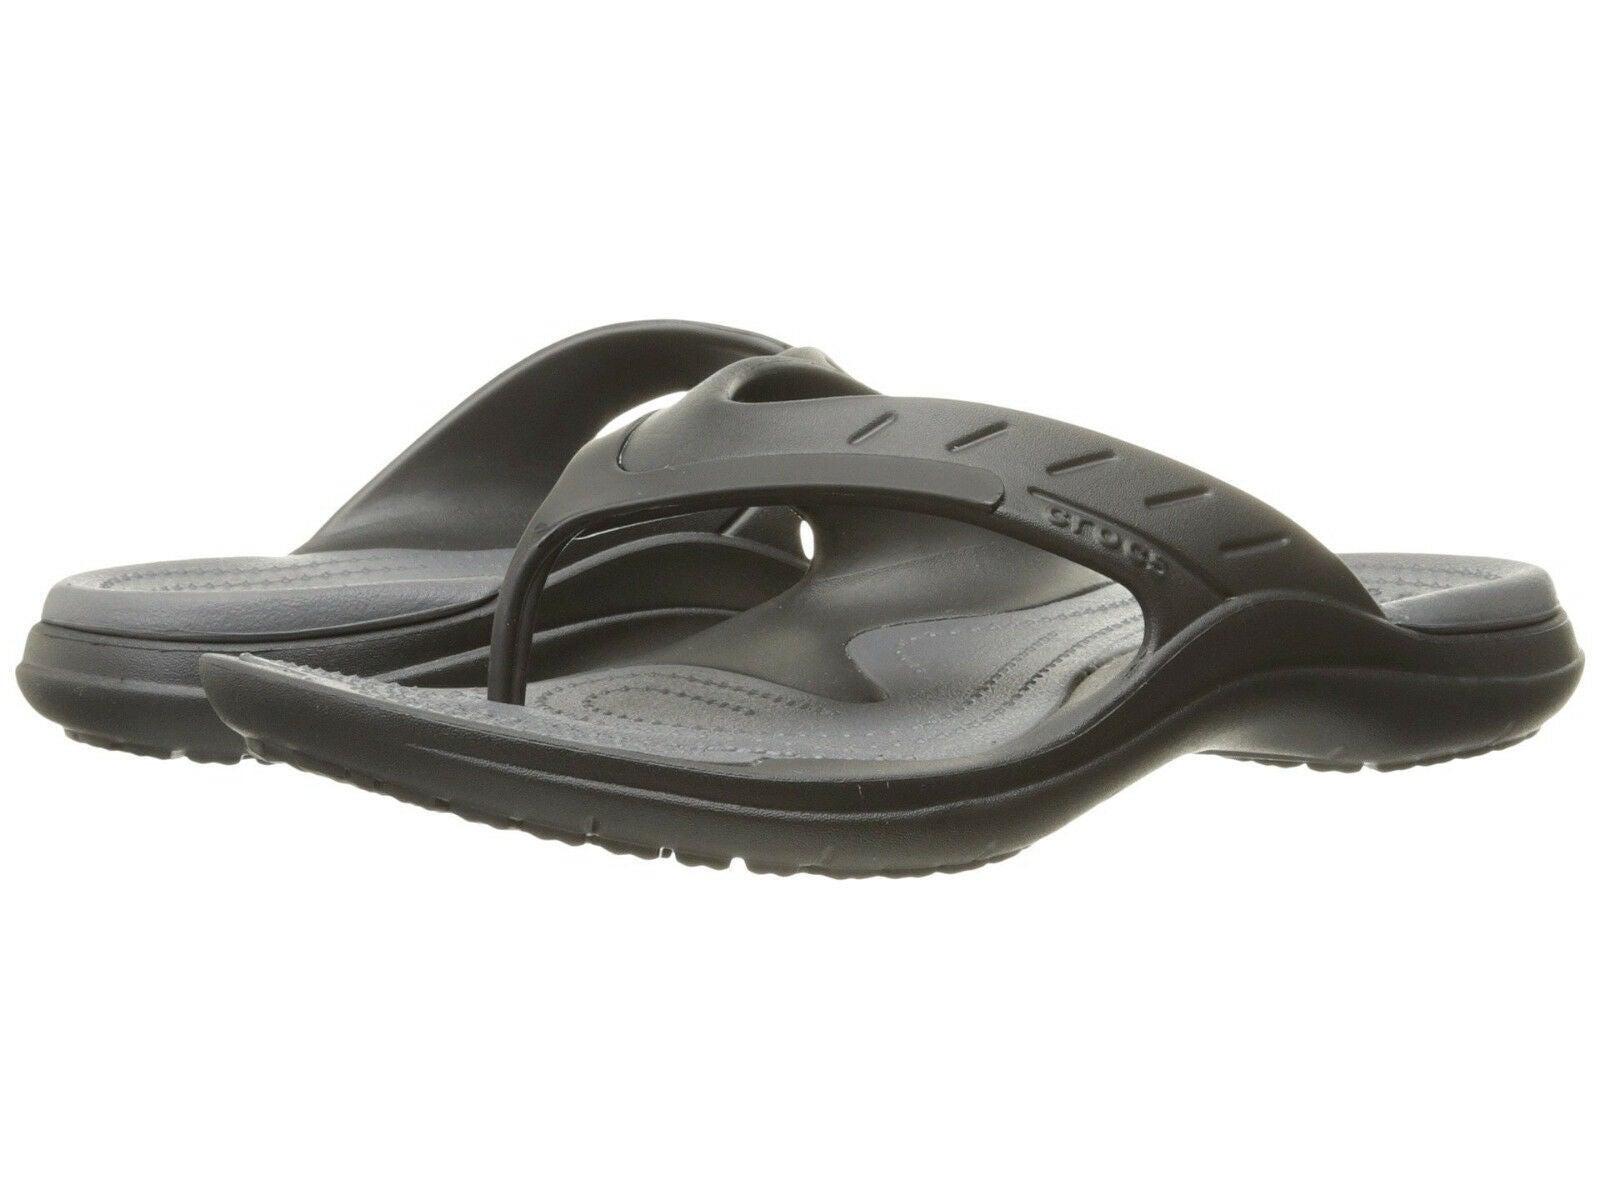 Crocs Men's Modi Sport Flip Flops Thongs Summer - Black/Graphite